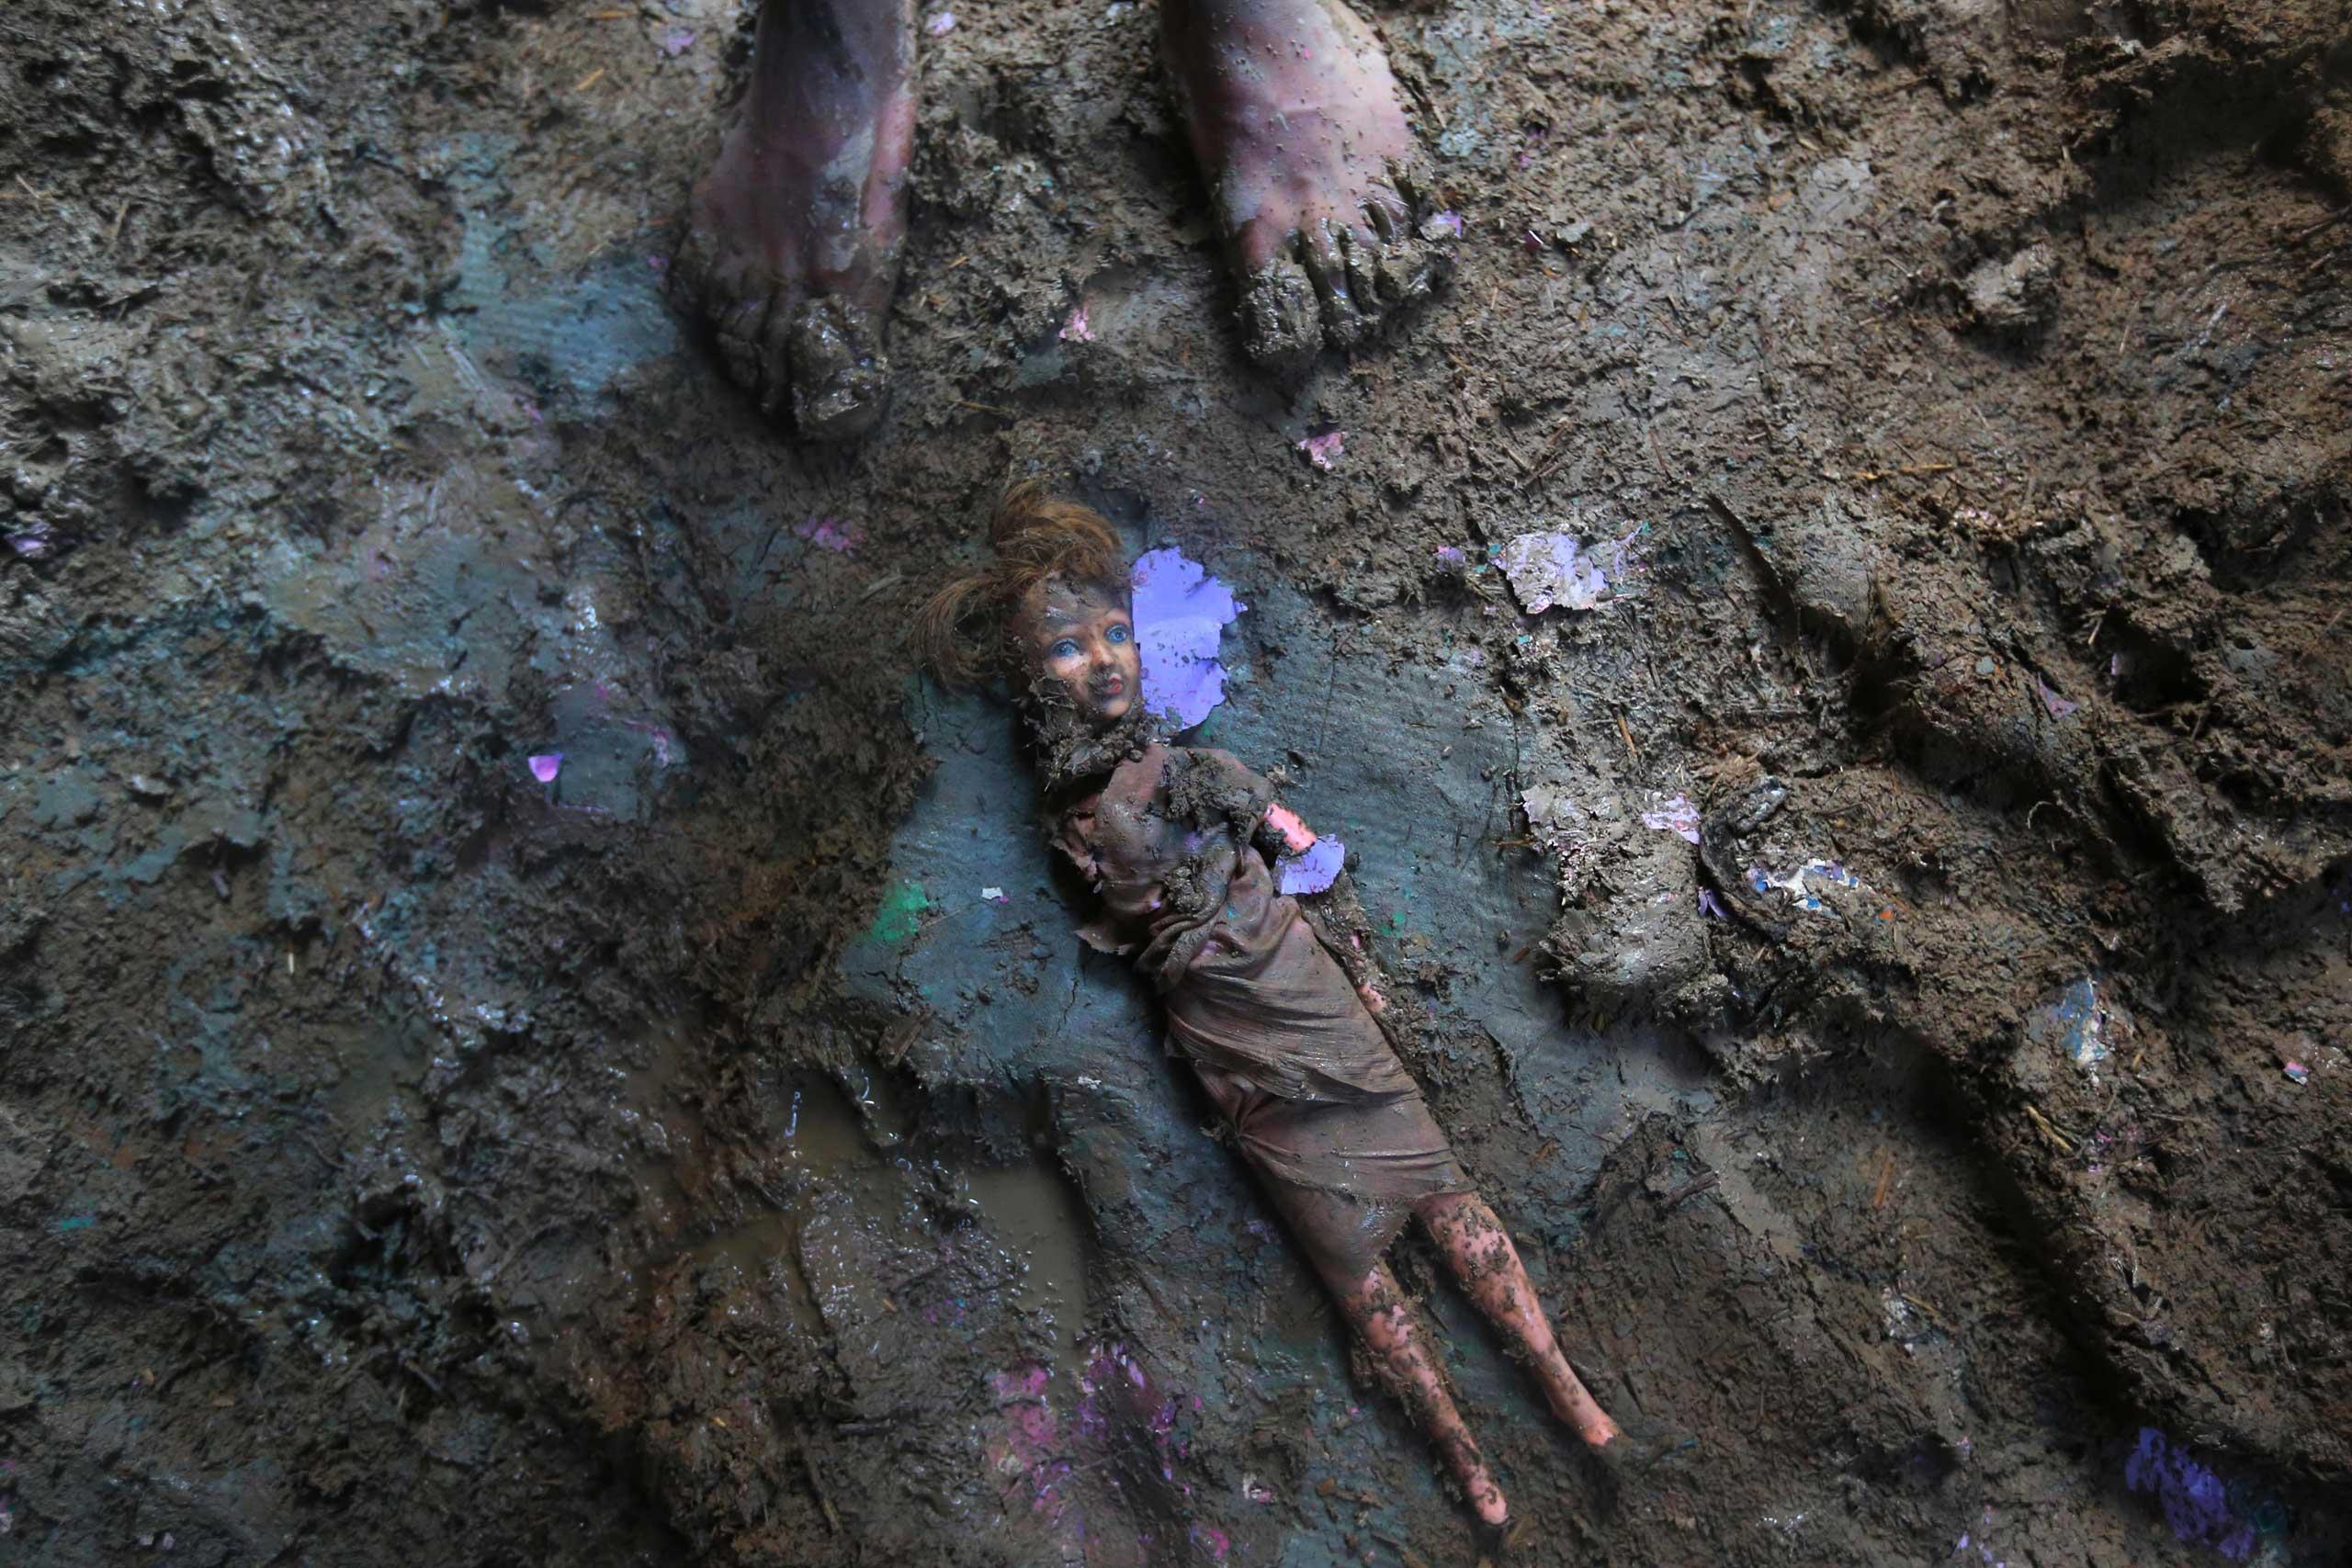 Sept. 19, 2014. A Kashmiri stands near a doll smeared with mud inside a flood damaged house in Srinagar,  India.